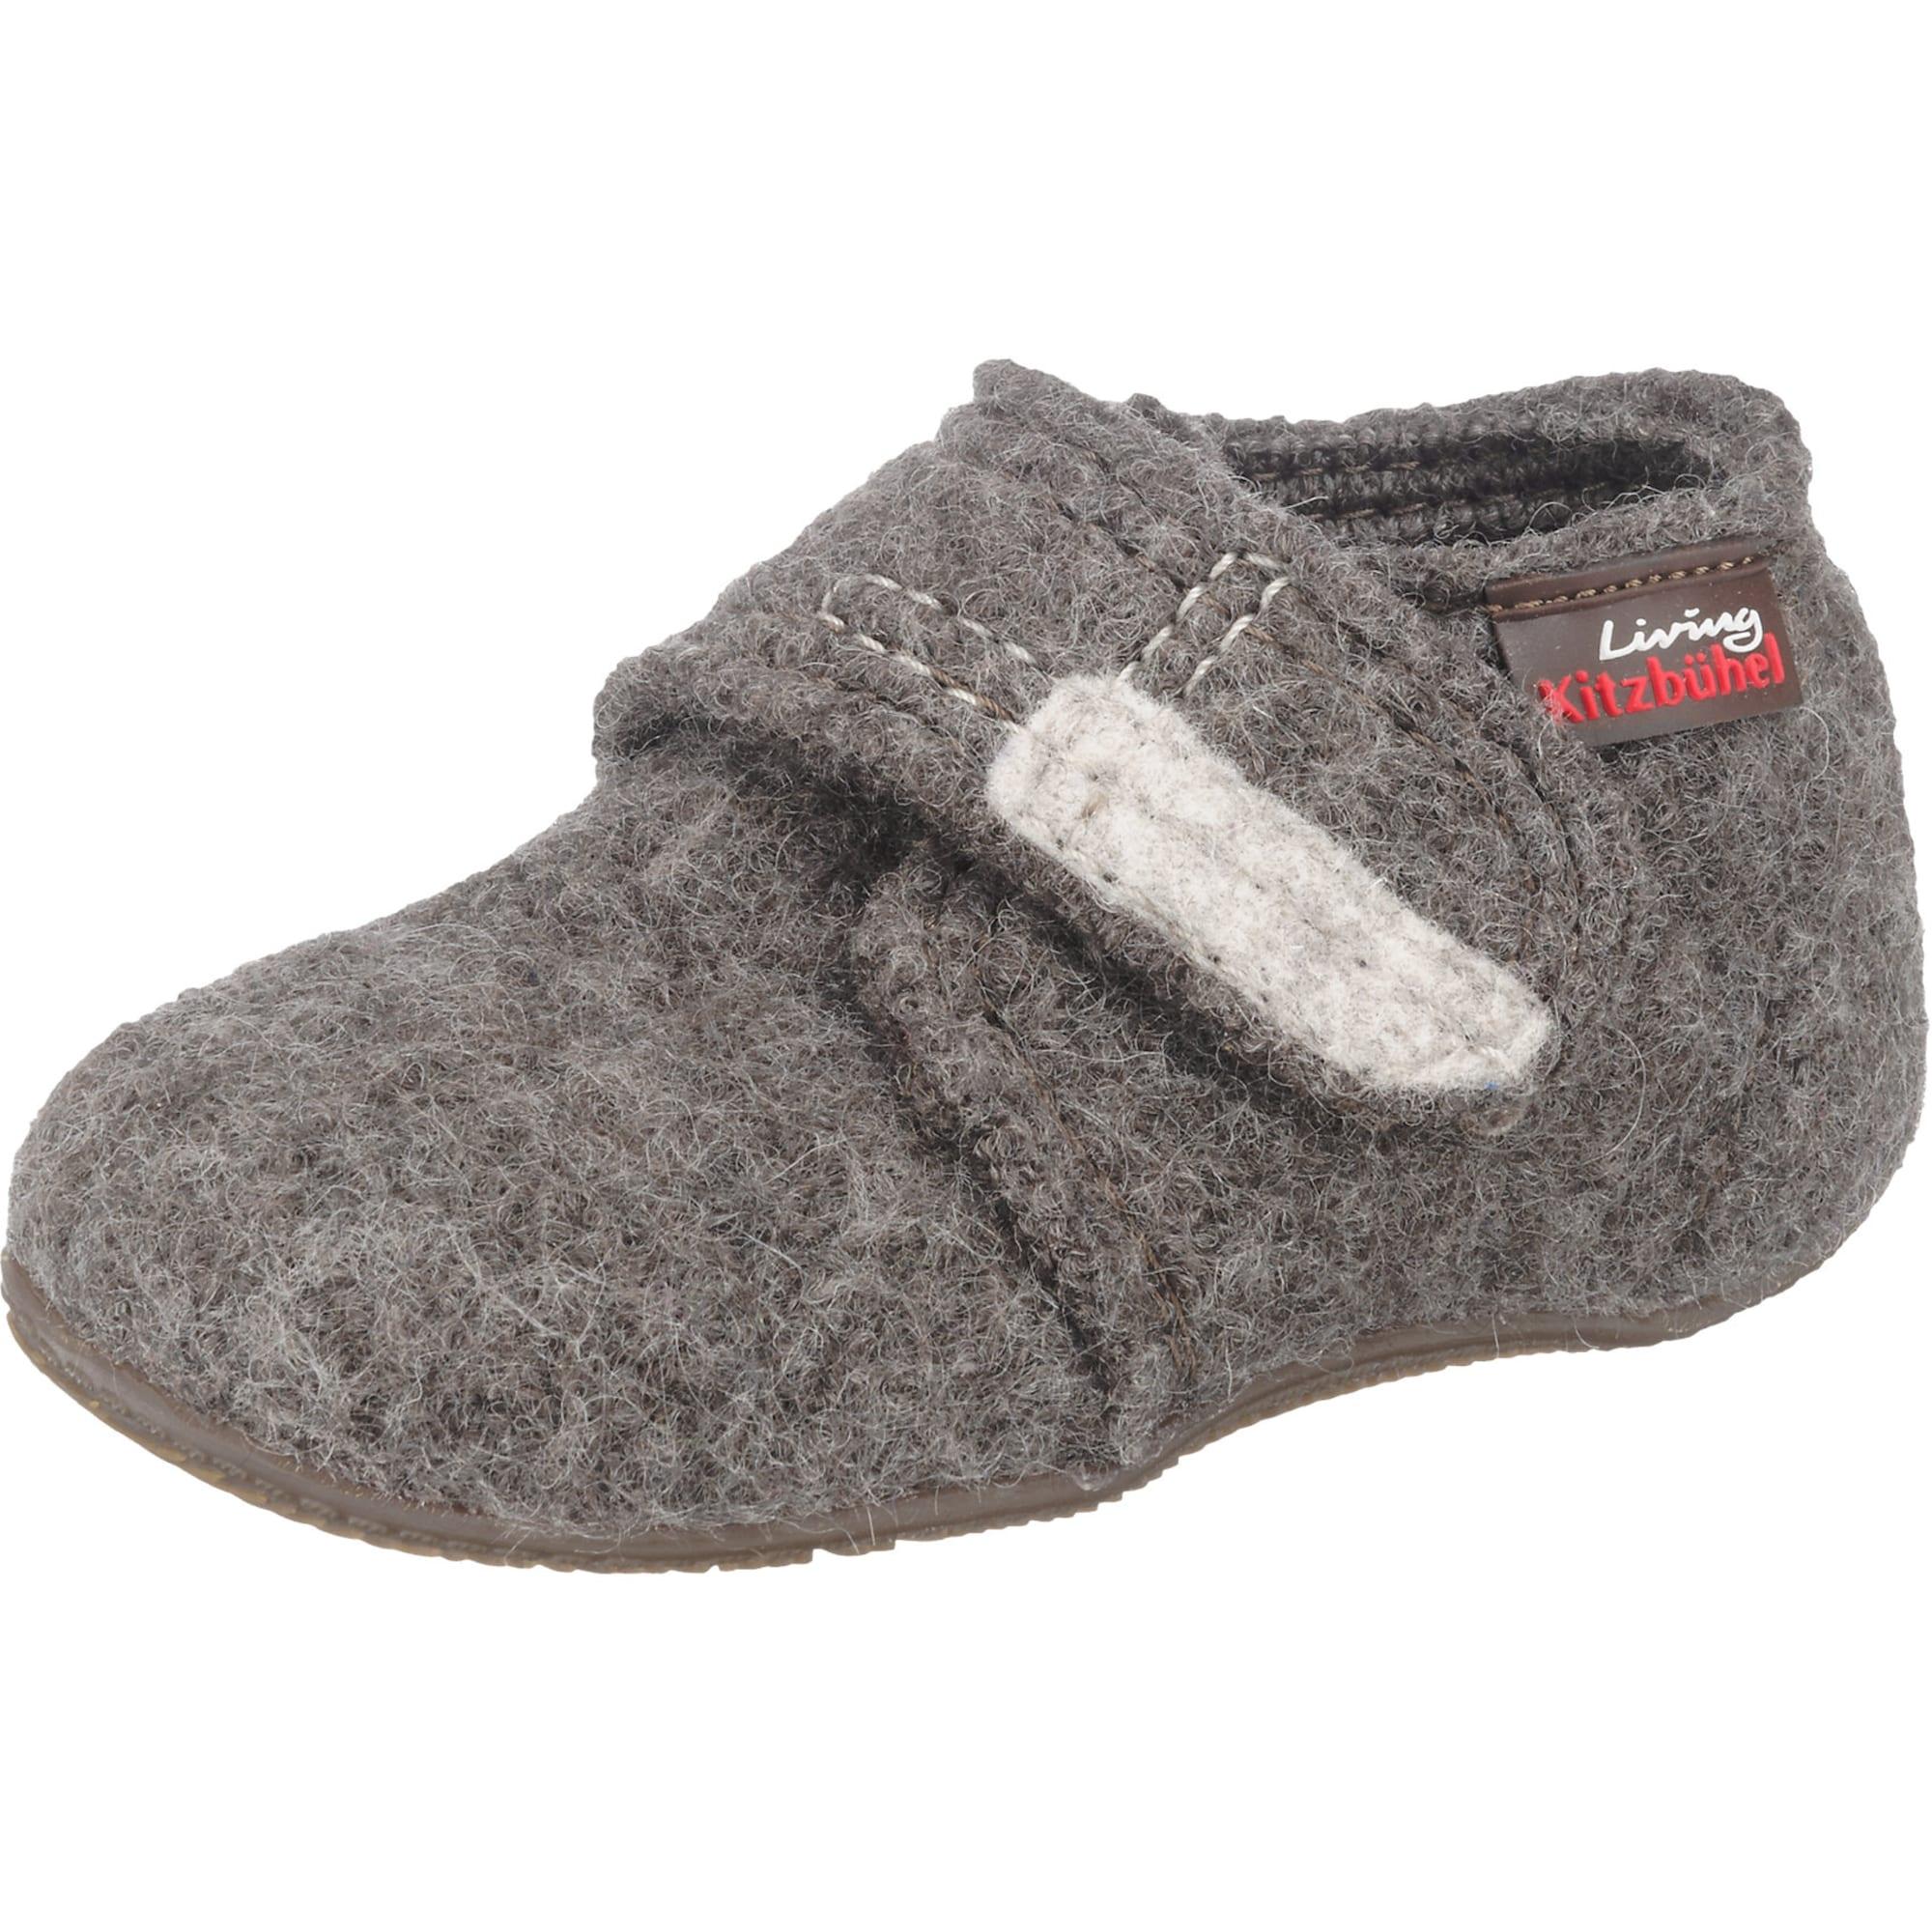 Pantofle režná bílá Living Kitzbühel